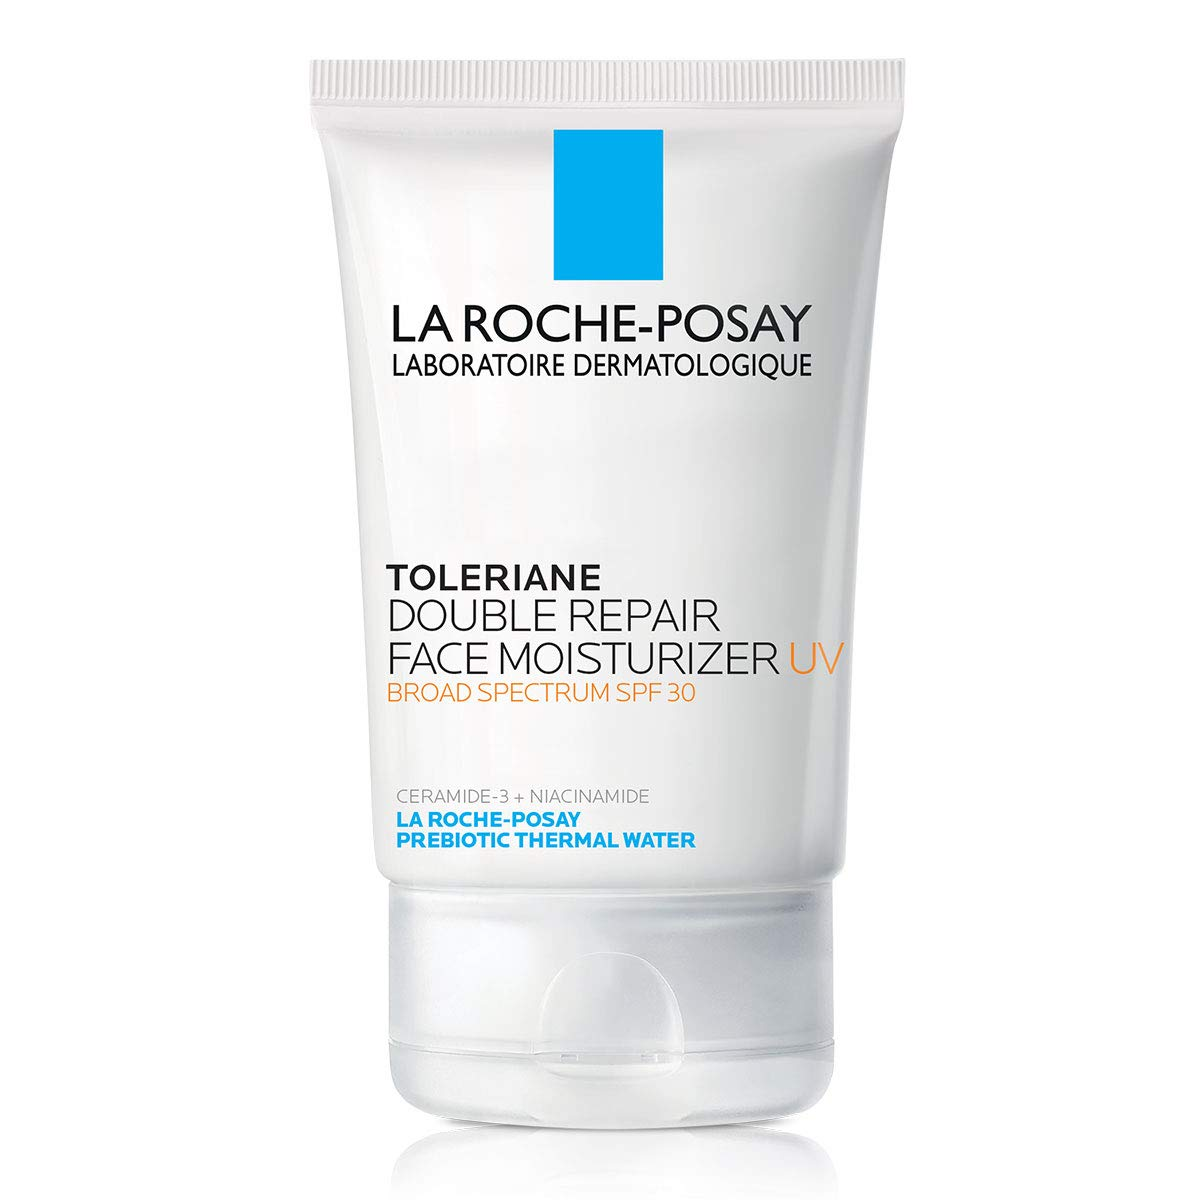 La Roche-Posay Toleriane Double Repair Face Moisturizer, Oil-Free Face Cream with Niacinamide